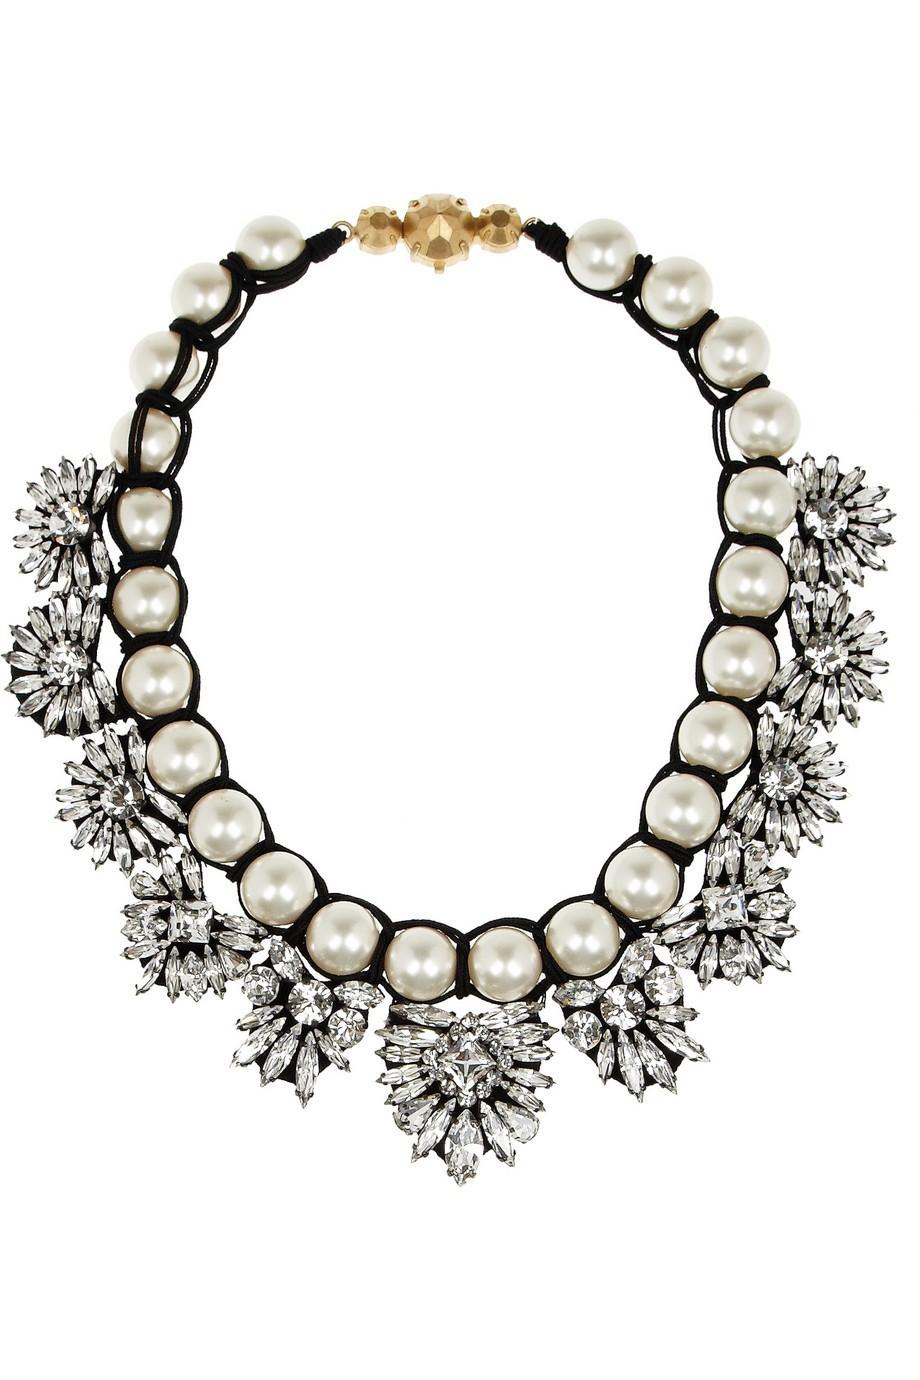 Здесь можно купить  2013 Shourouk white crystal and pearl knitted necklace fashion gem flower pedent necklace Vintage statement choker necklace   Ювелирные изделия и часы